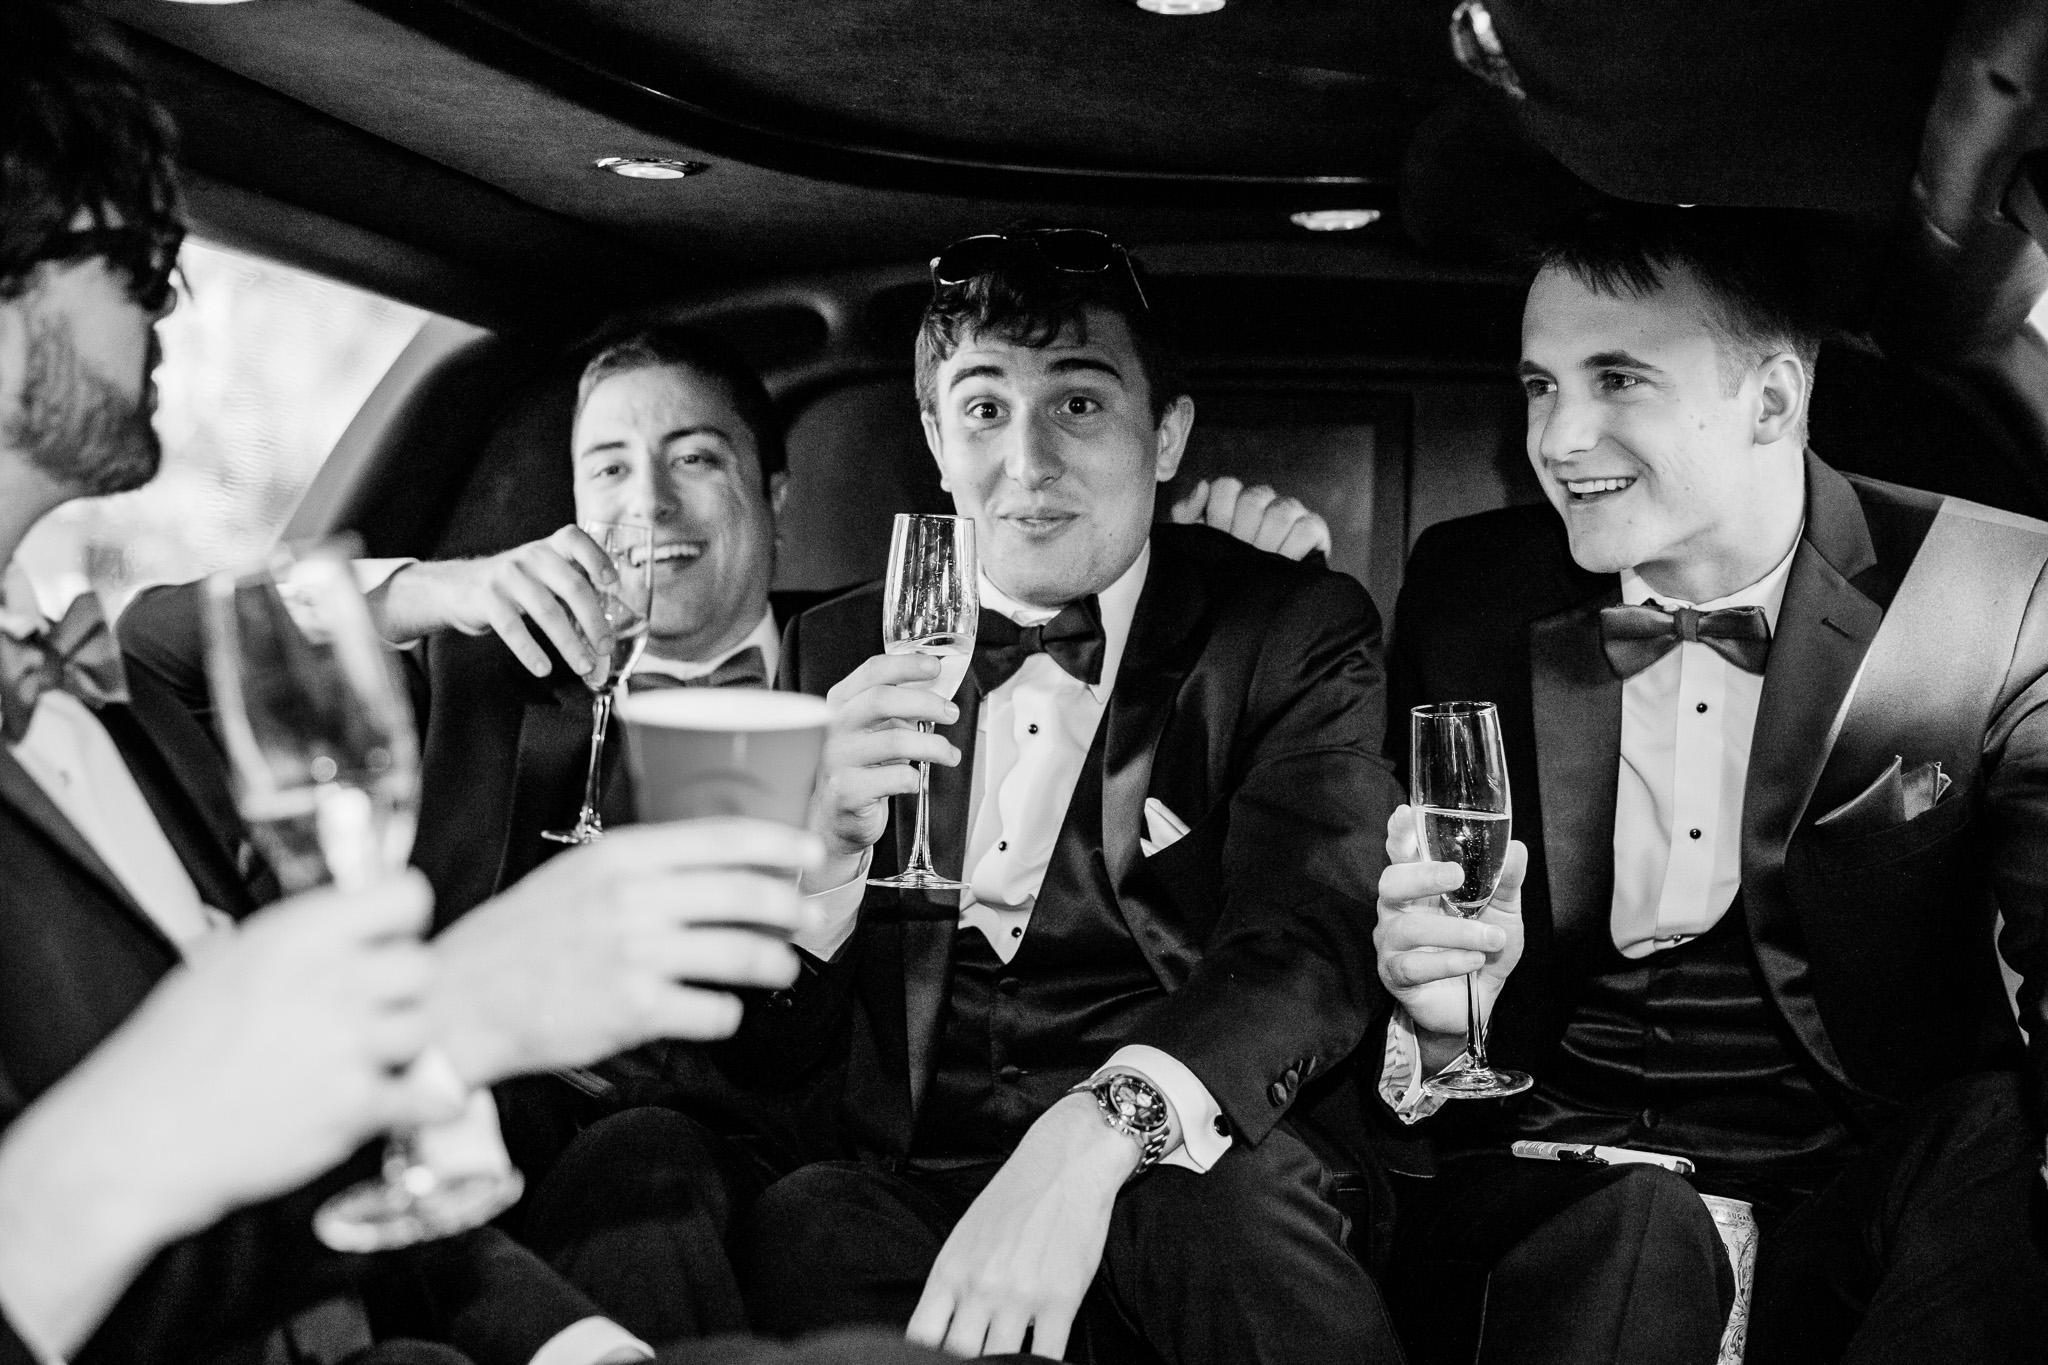 TAMPA_WEDDING_PHOTOGRAPHER_MPMZ_TJP40613_0035.jpg